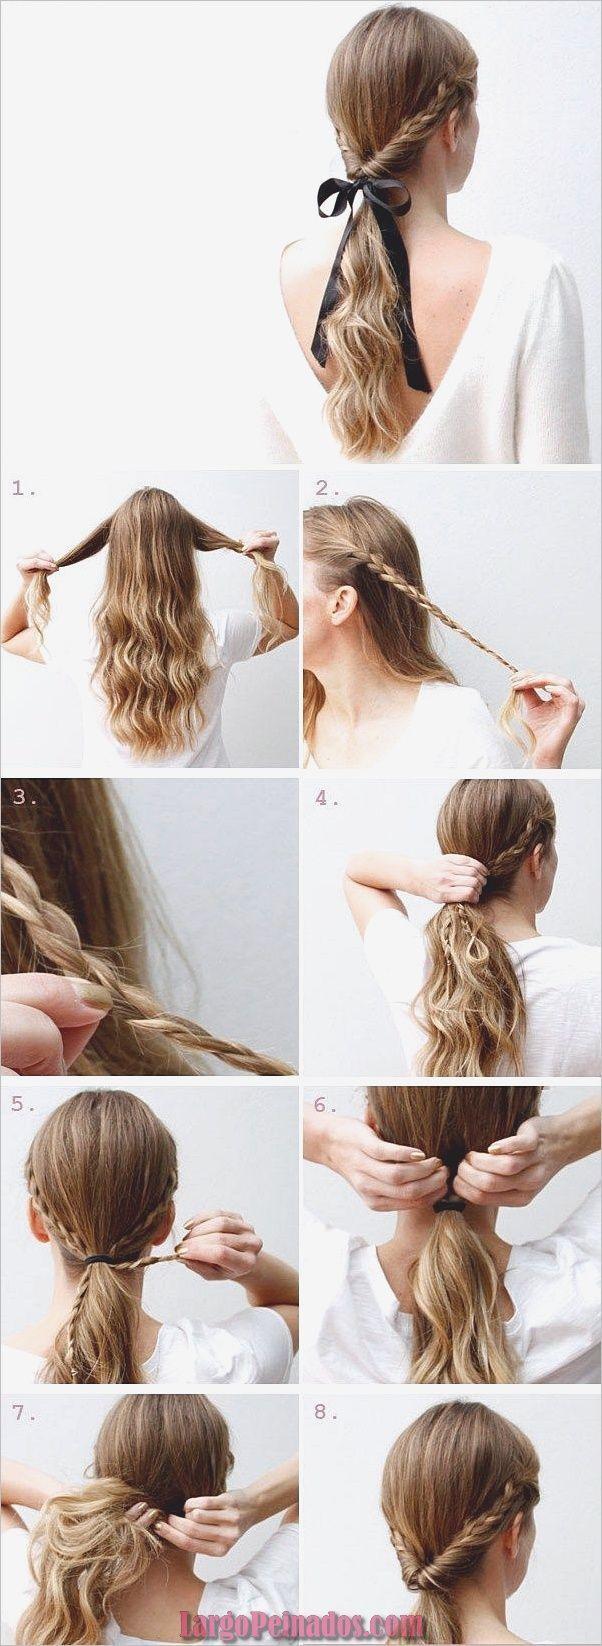 35 Peinados paso a paso fáciles y rápidos para niñas » Largo Peinados